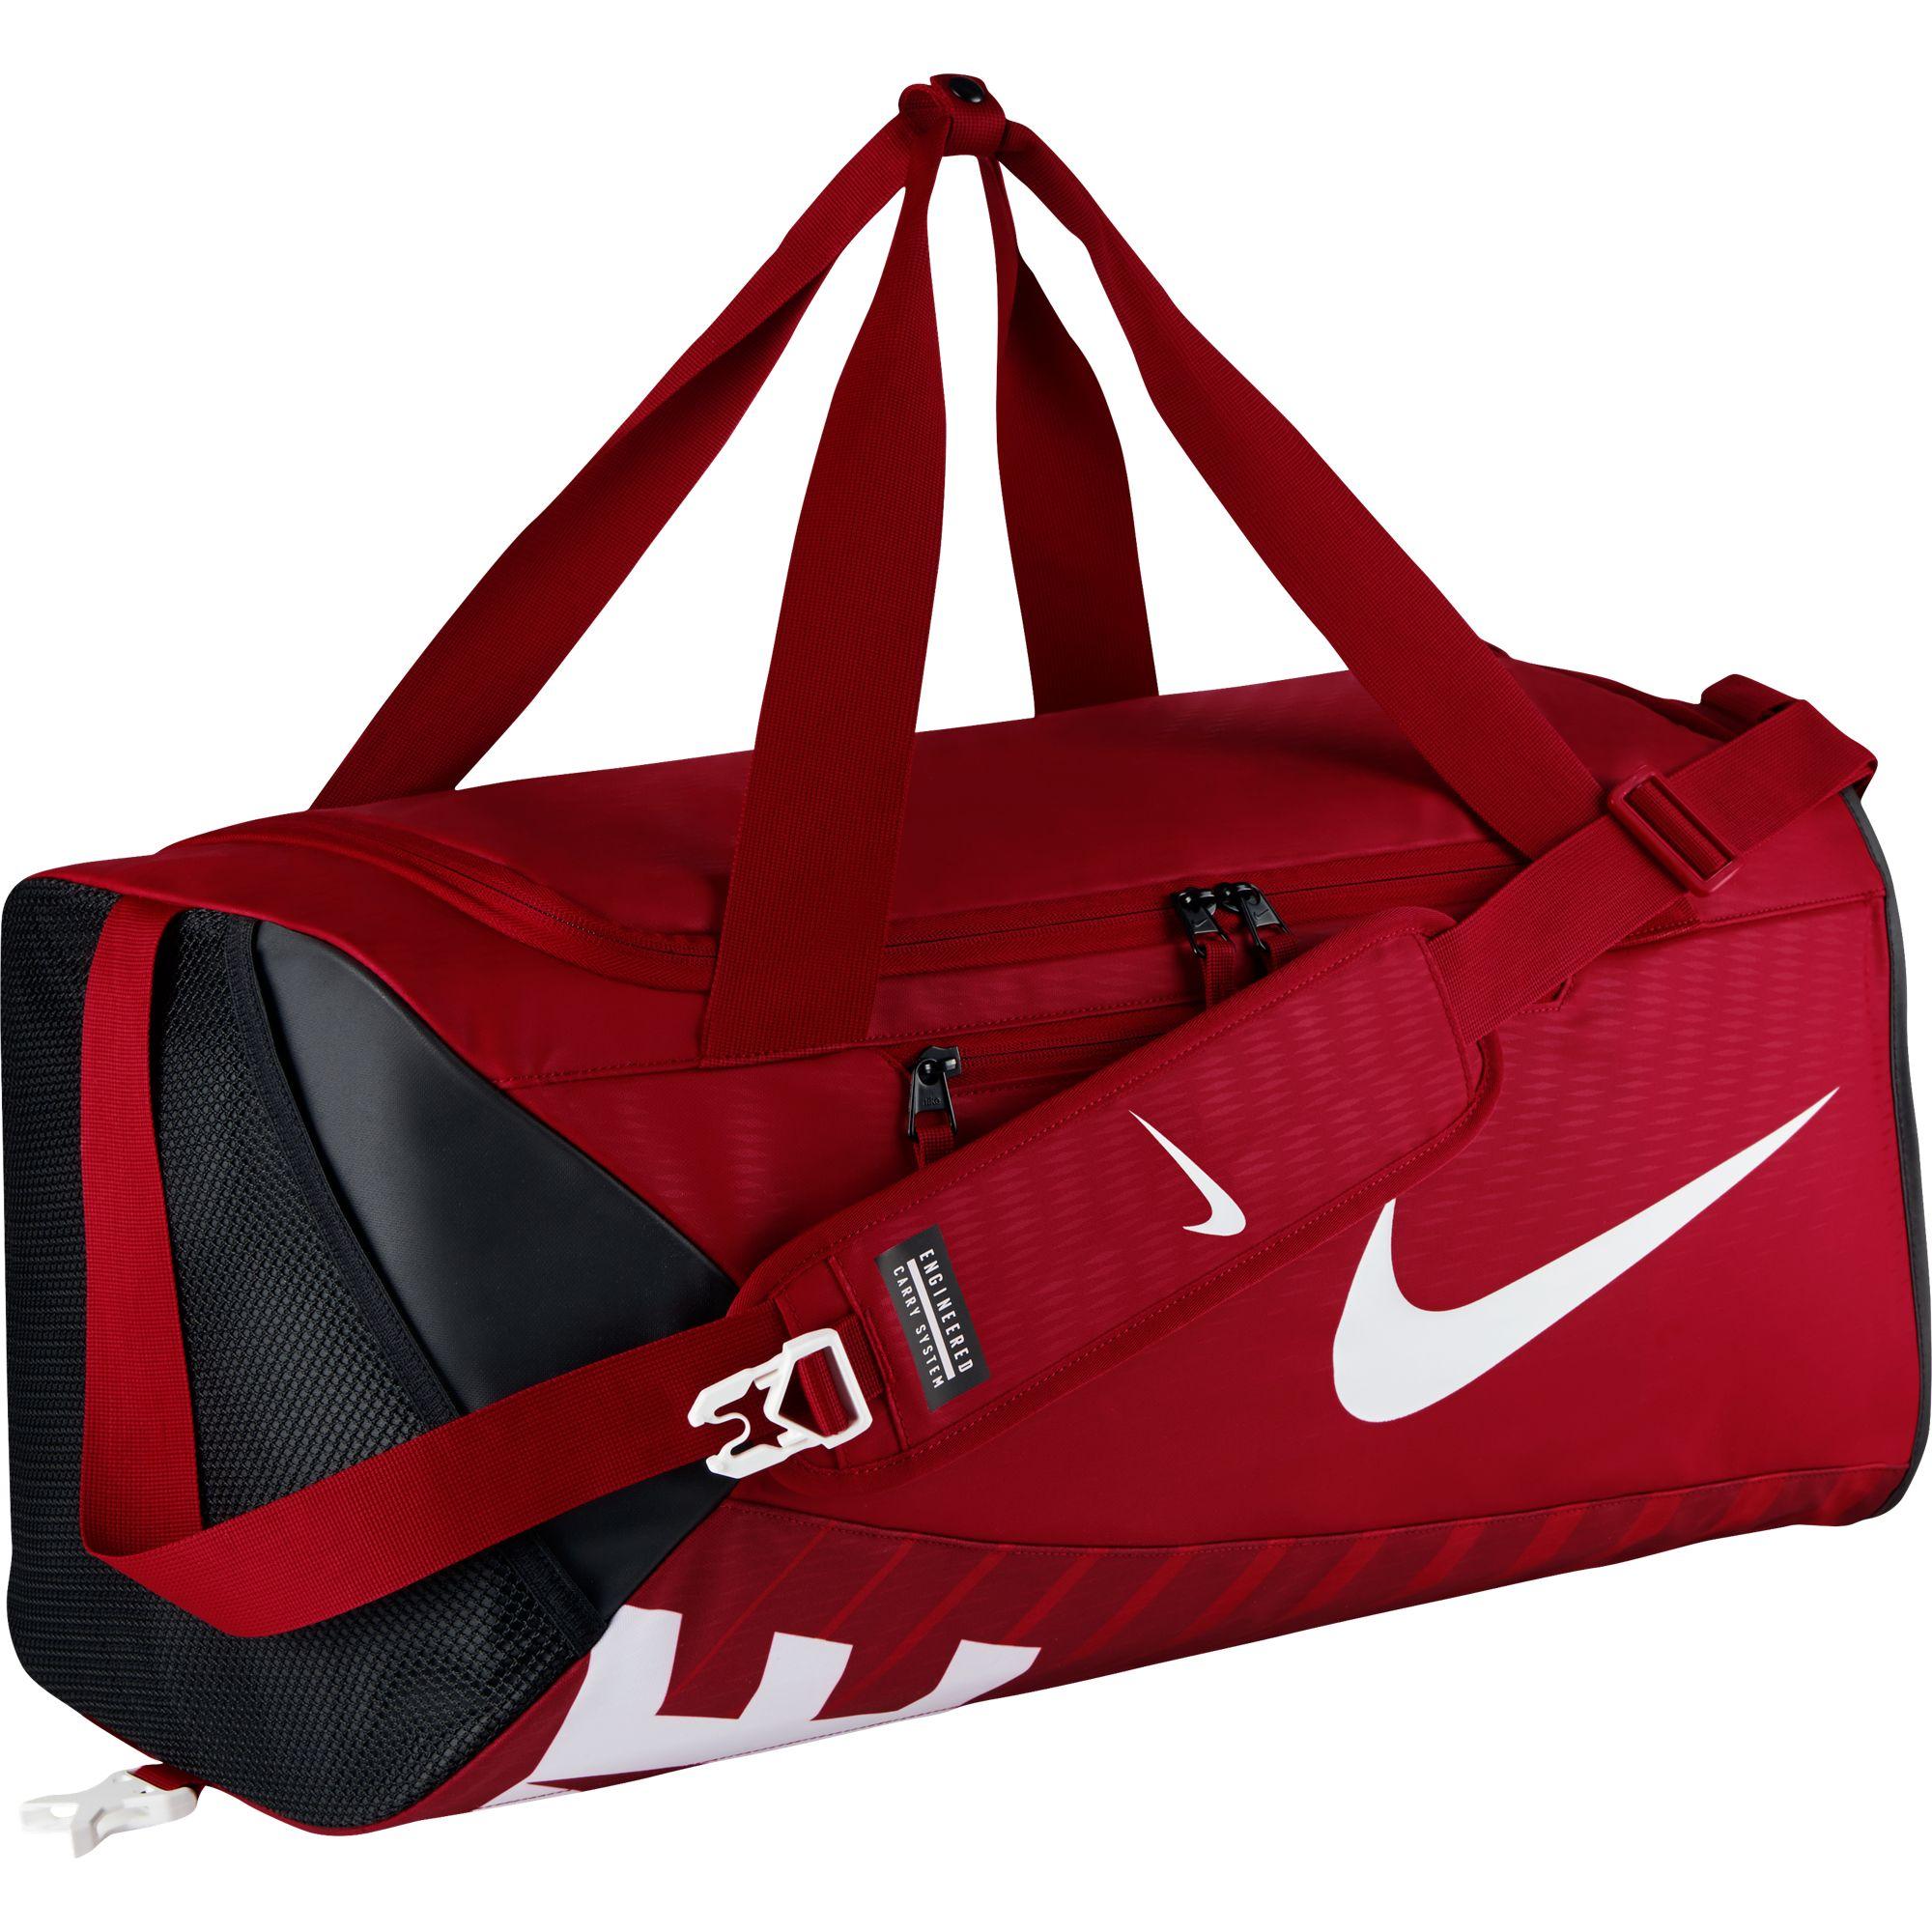 1ed0badfa3892 Športová taška Nike ALPHA ADAPT Crossbody (MEDIUM) červená   AD Sport.sk